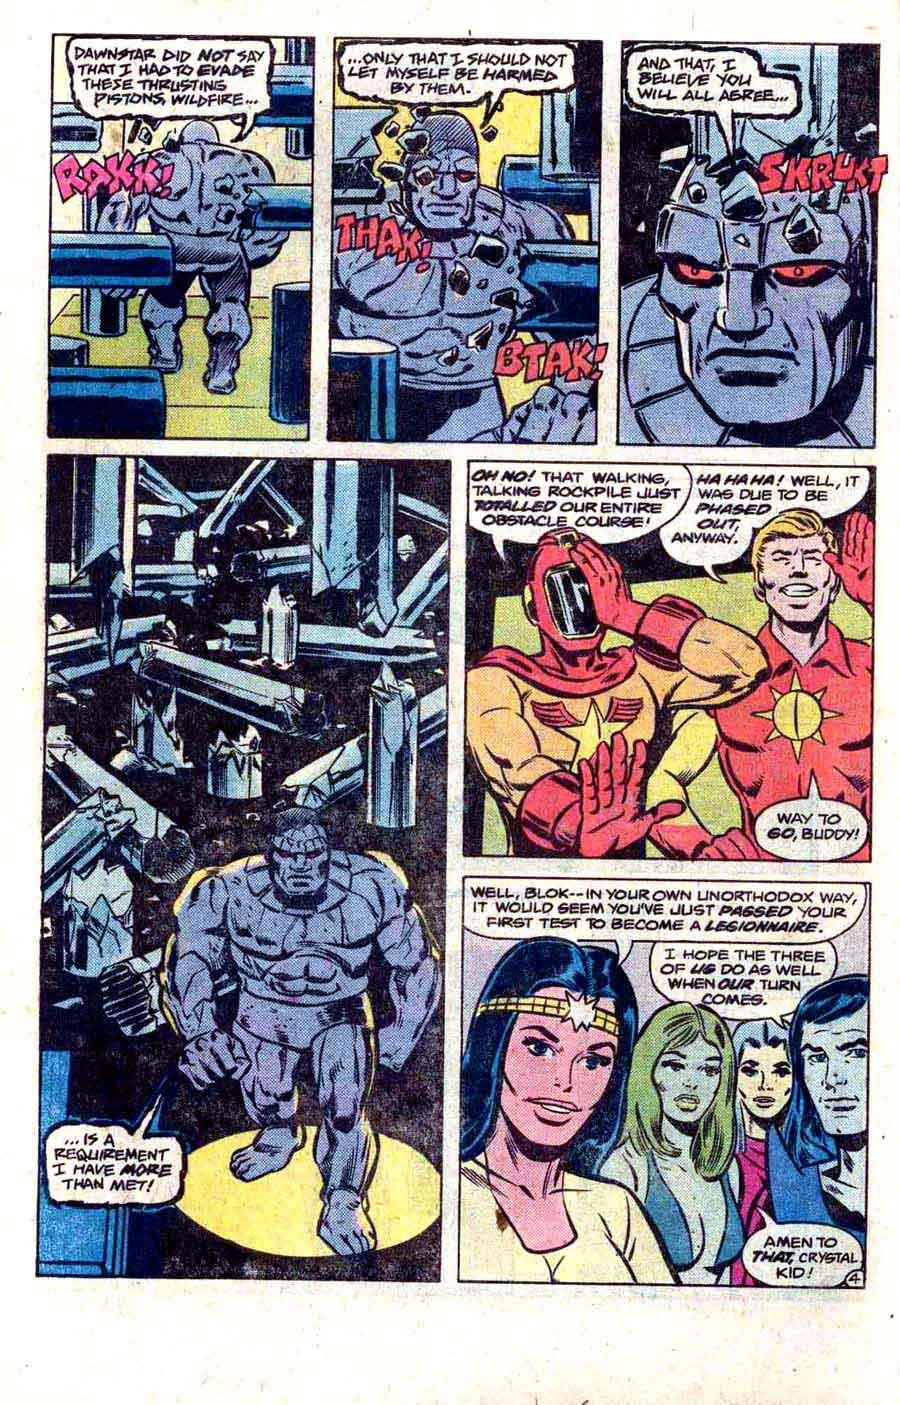 Legion of Super-Heroes v2 #272 - Steve Ditko dc 1980s comic book page art